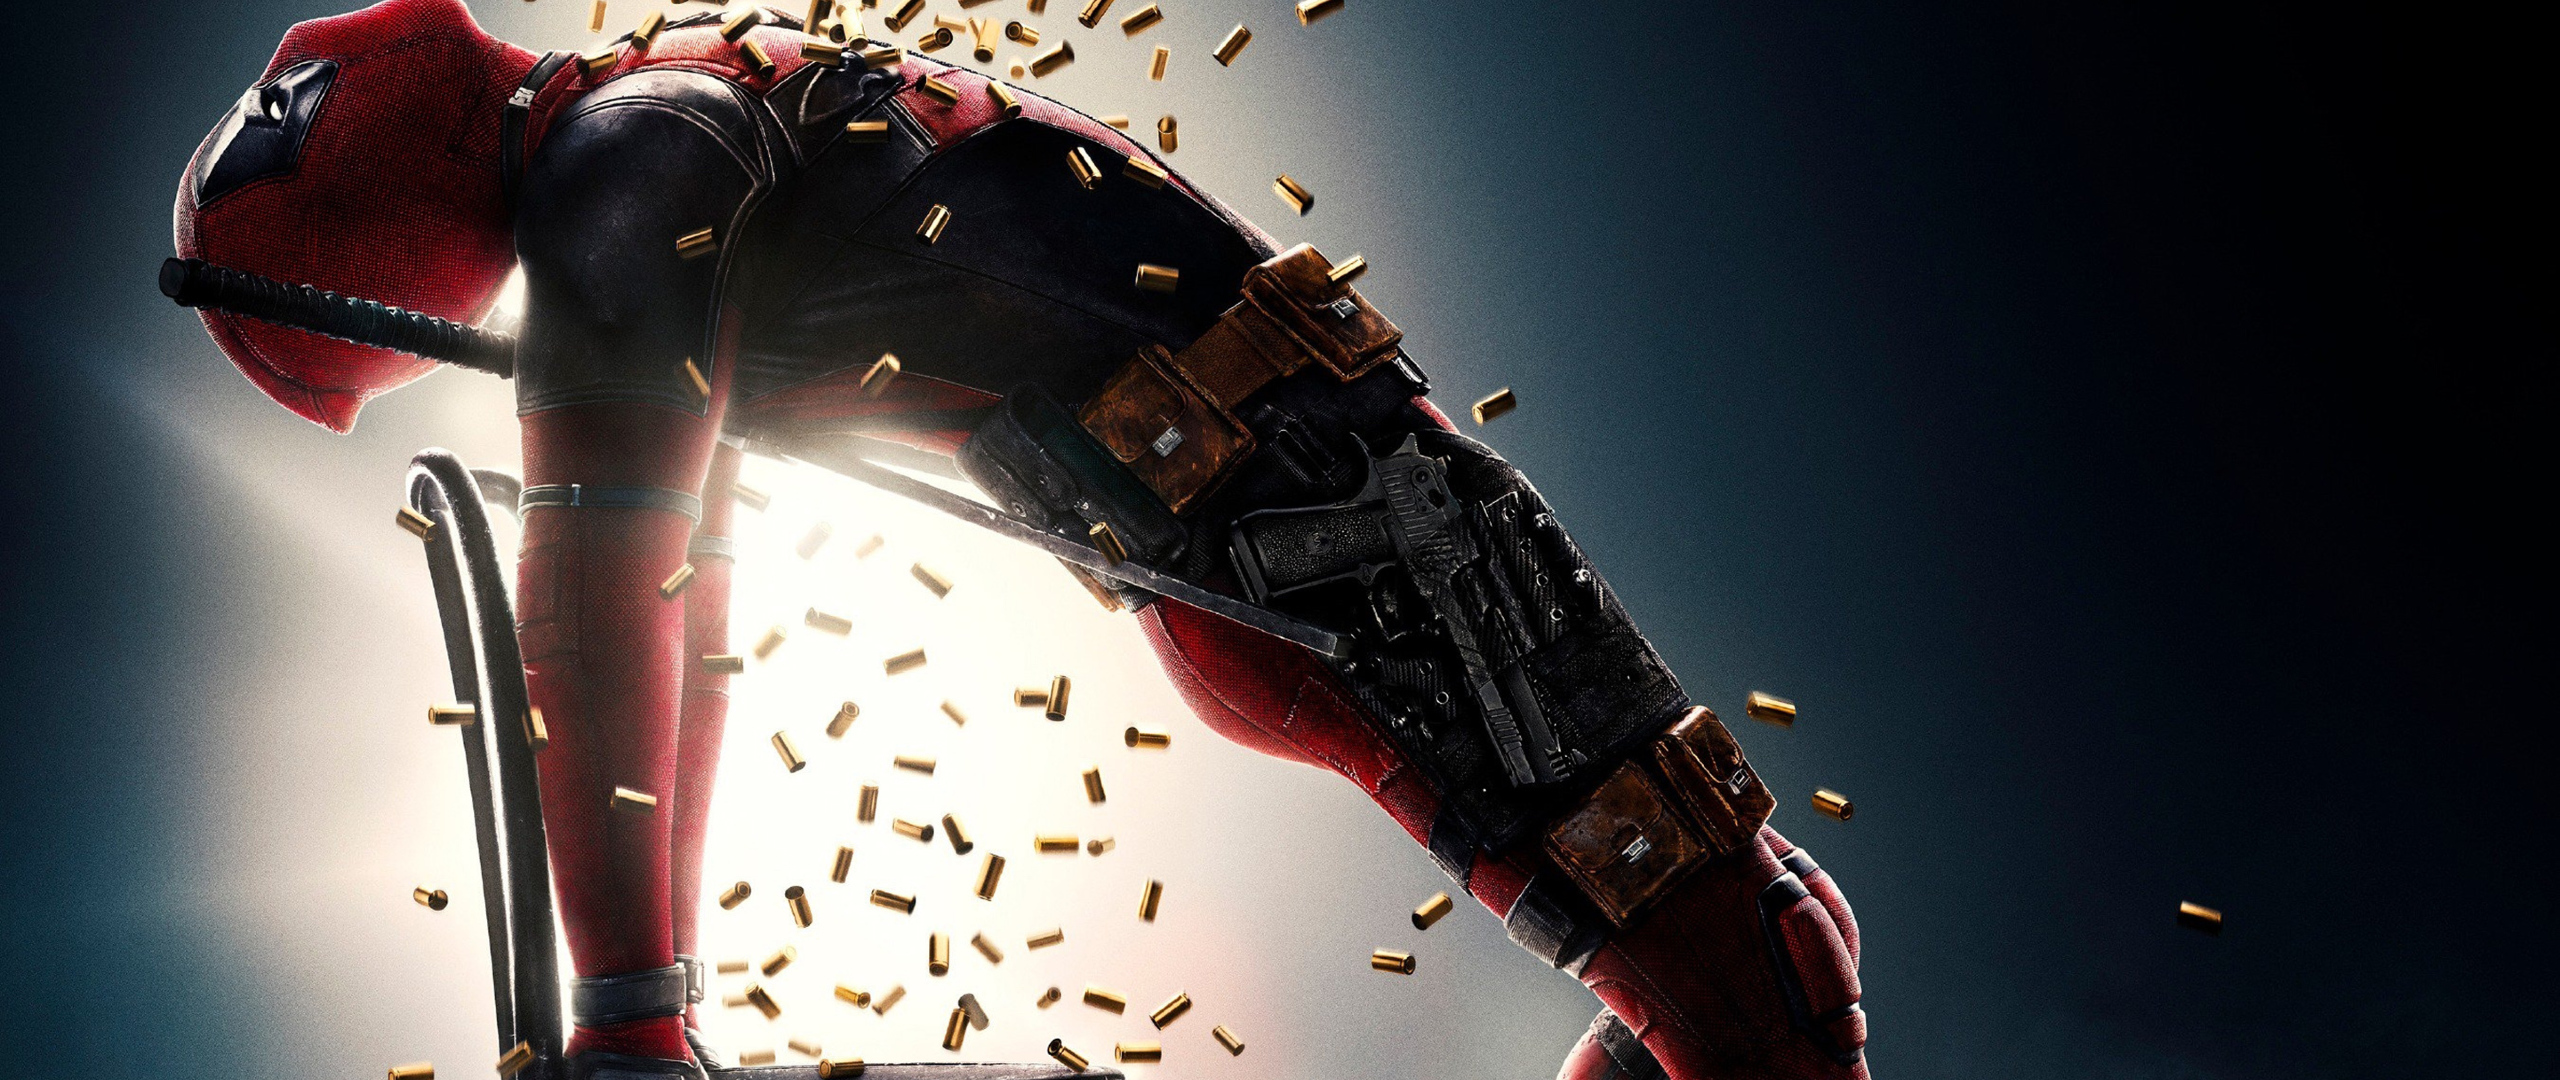 Deadpool 2 Official Poster, Full HD 2K Wallpaper